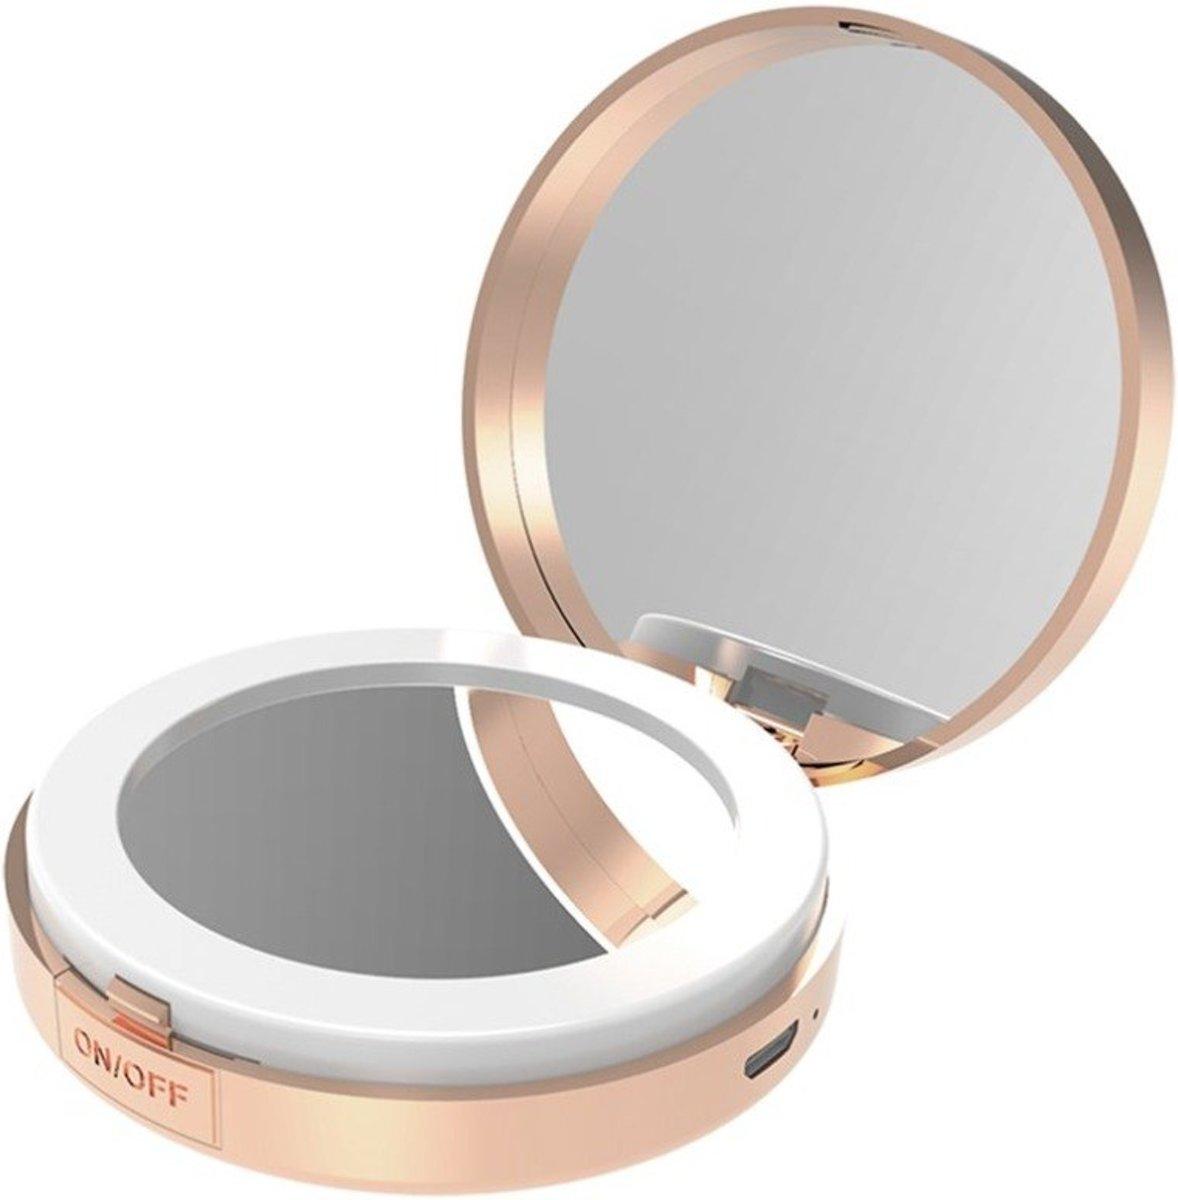 ronde make up spiegel met 3 kleuren led oplaadbaar make. Black Bedroom Furniture Sets. Home Design Ideas